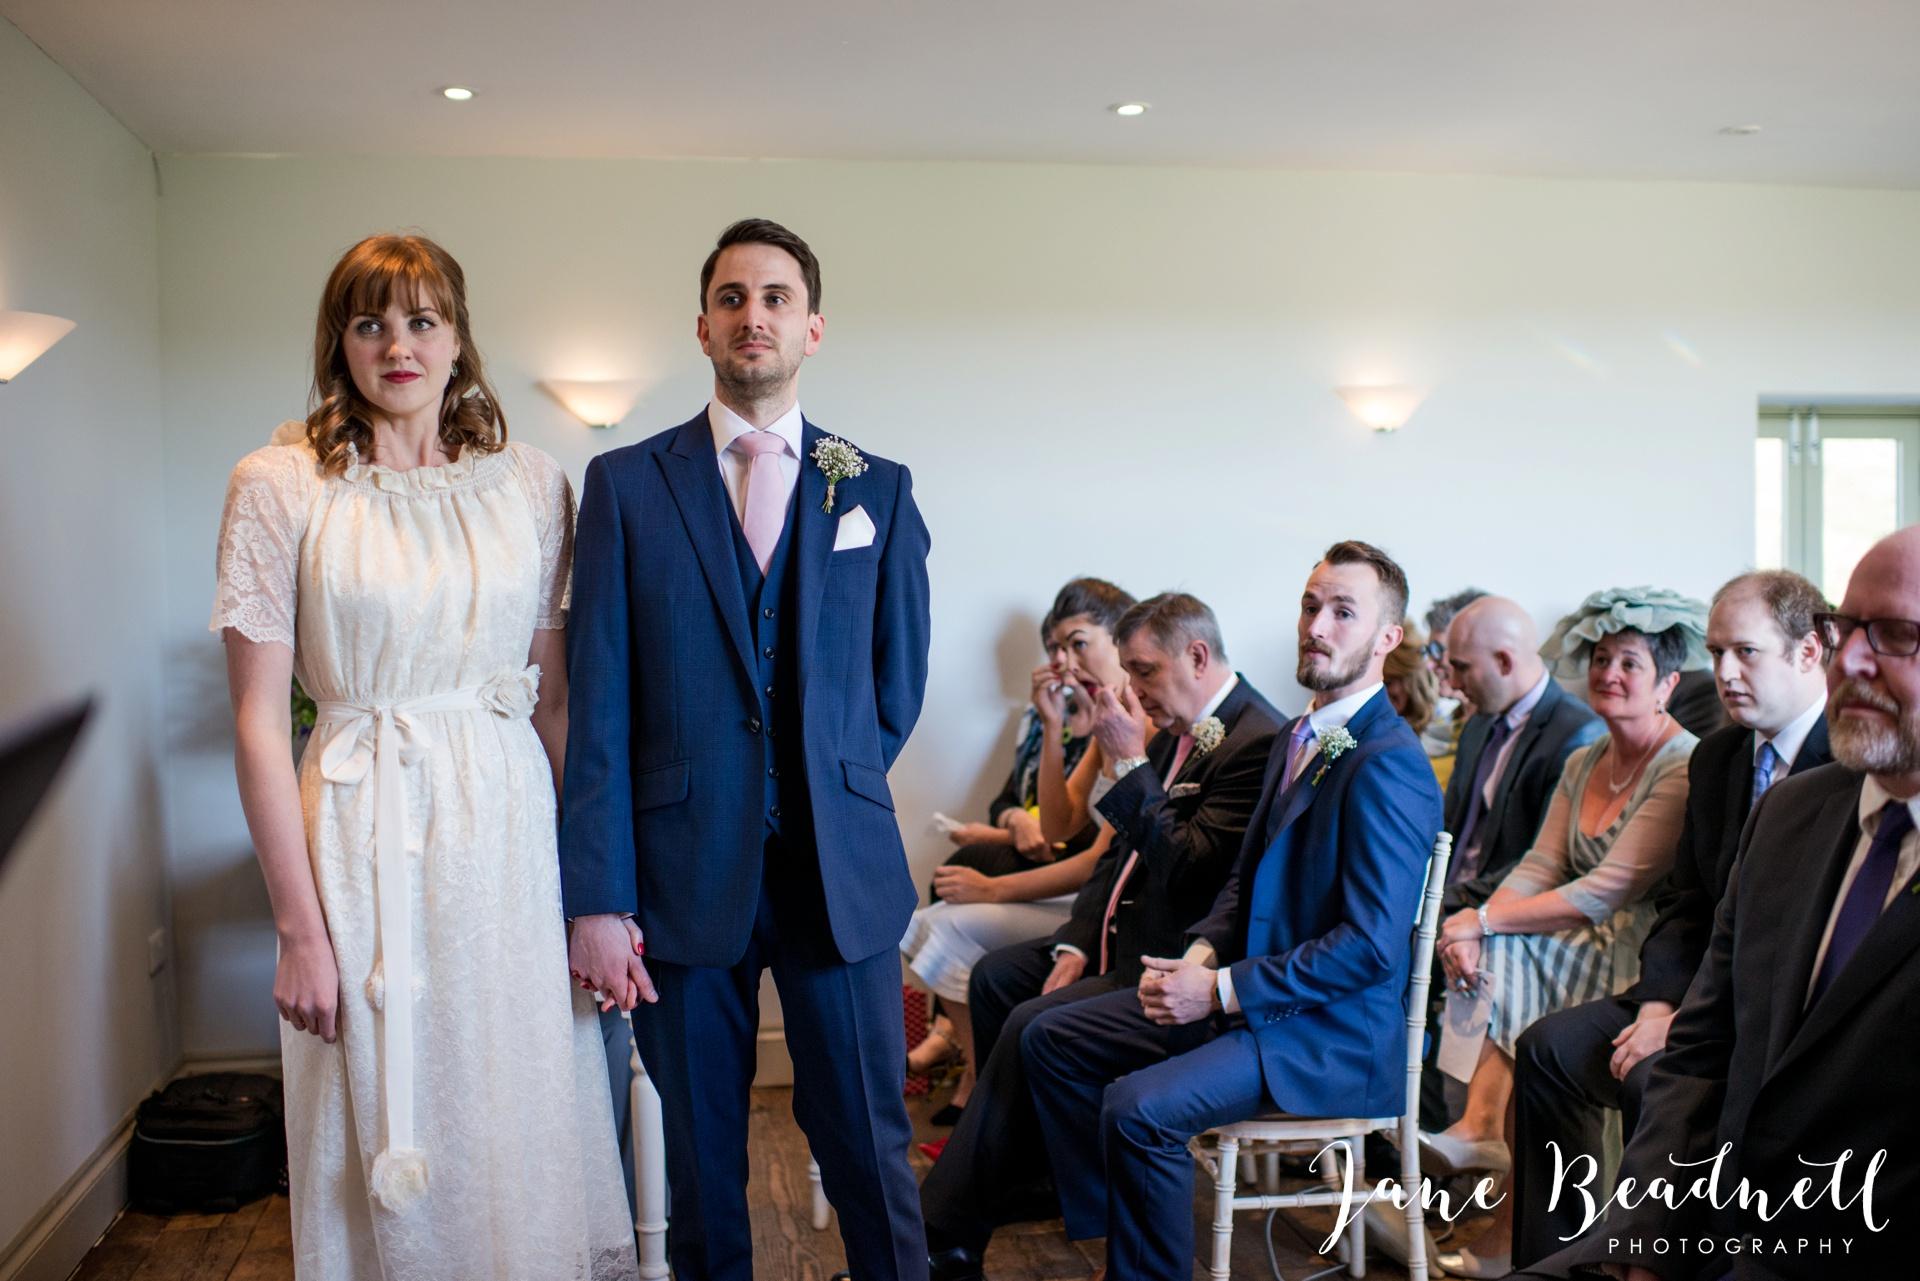 Jane Beadnell fine art wedding photographer The Cheerful Chilli Barn Otley_0016